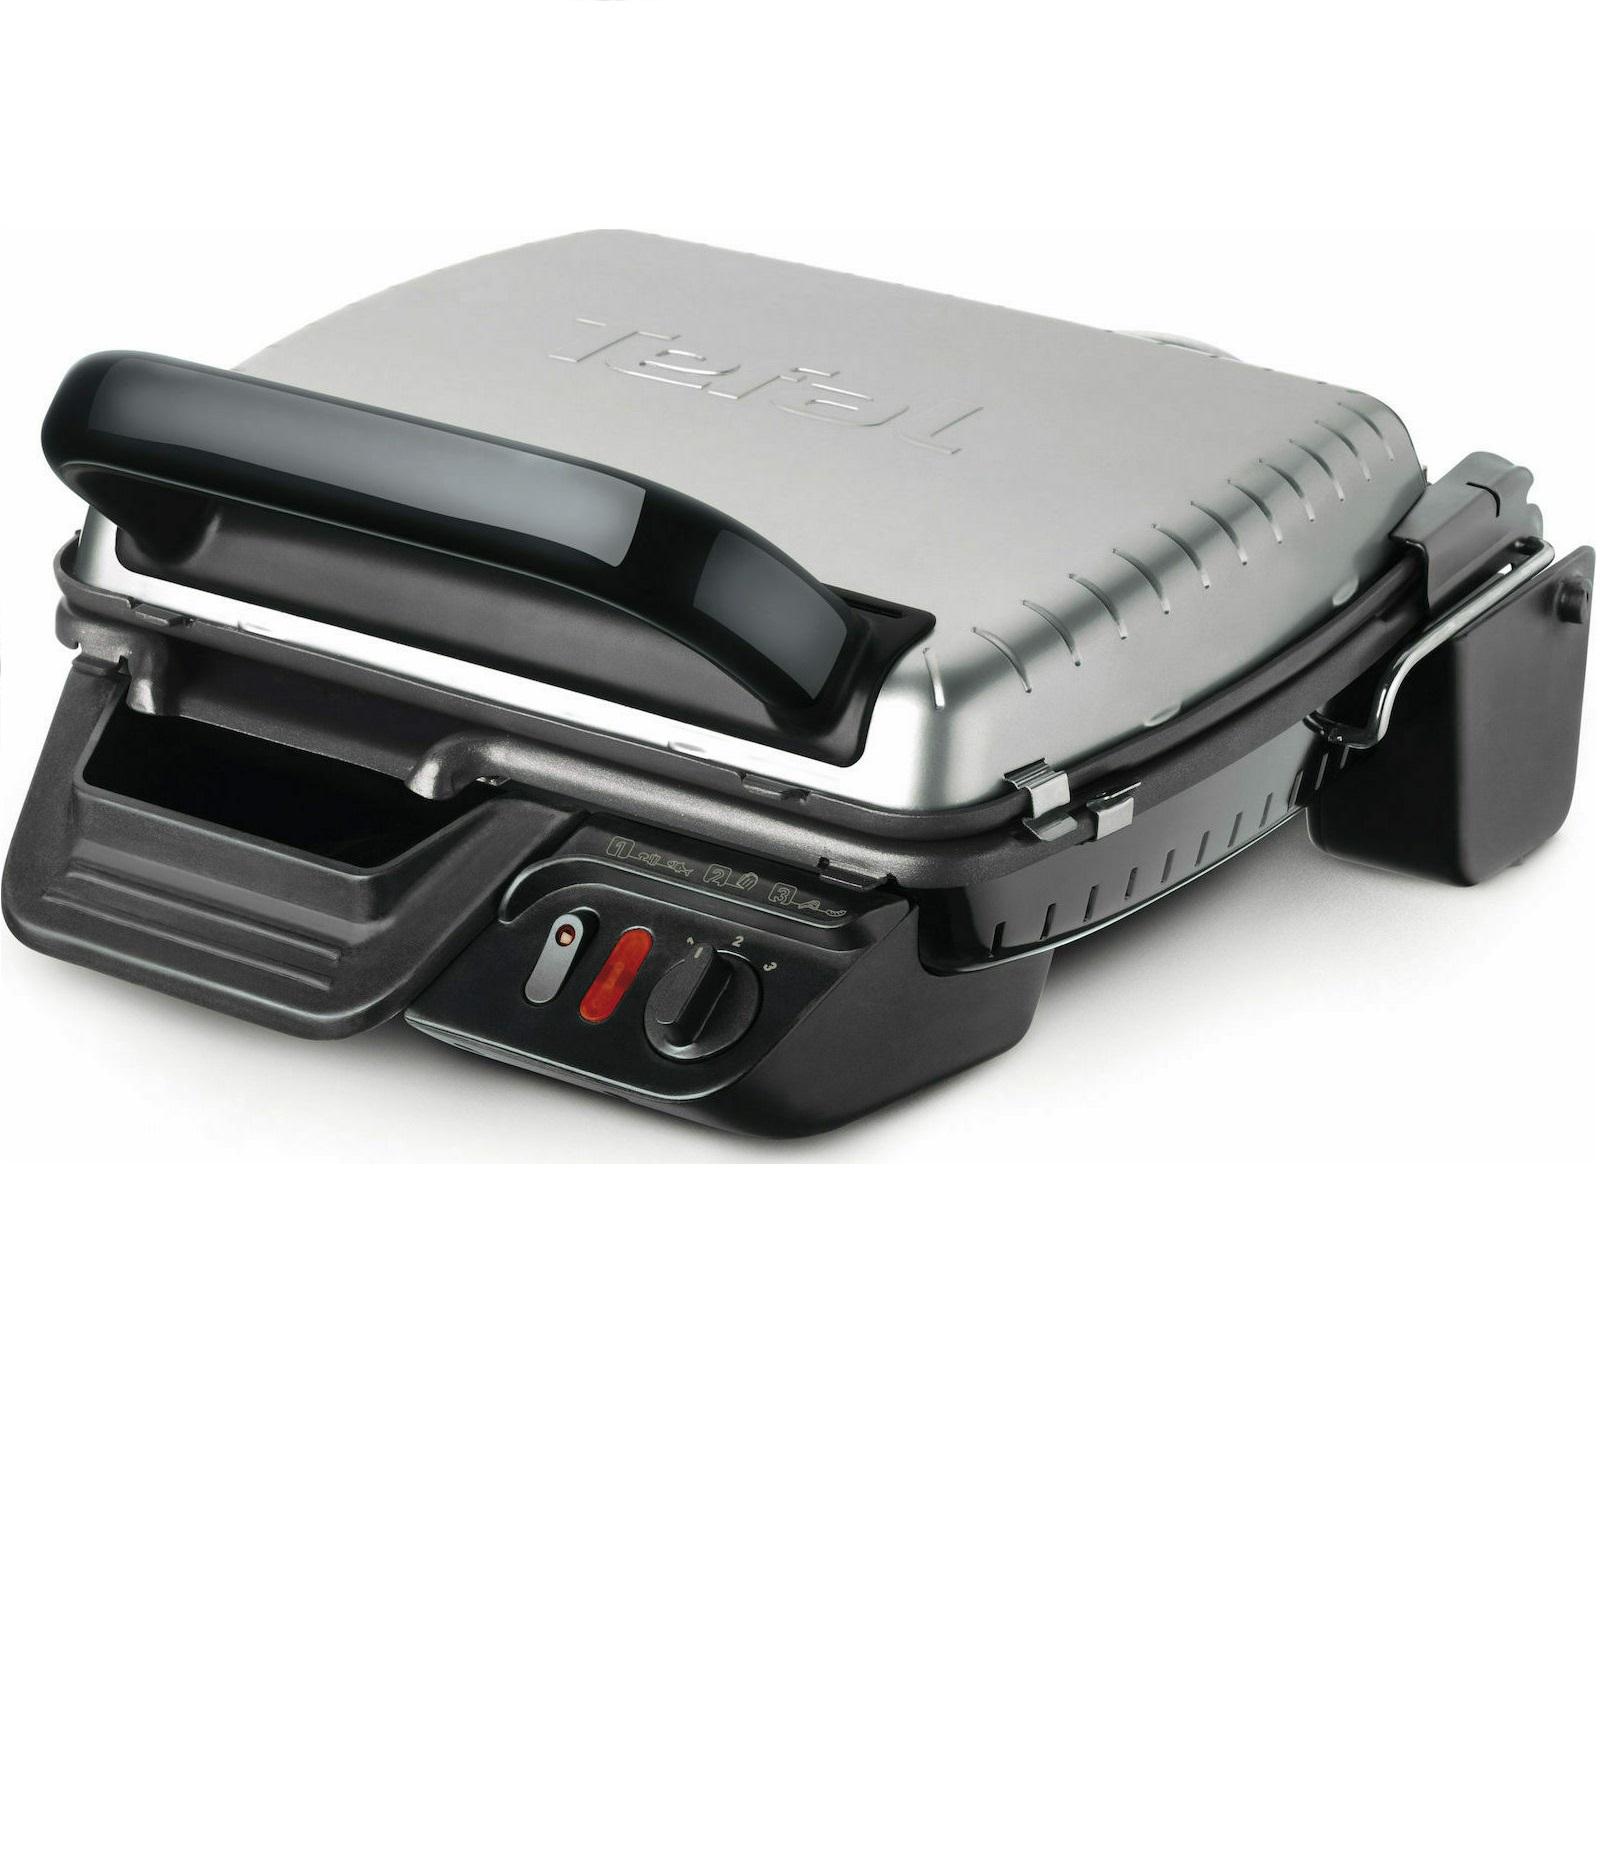 20201023131034 Tefal Griliera Gc3050 Ultra Compact 600